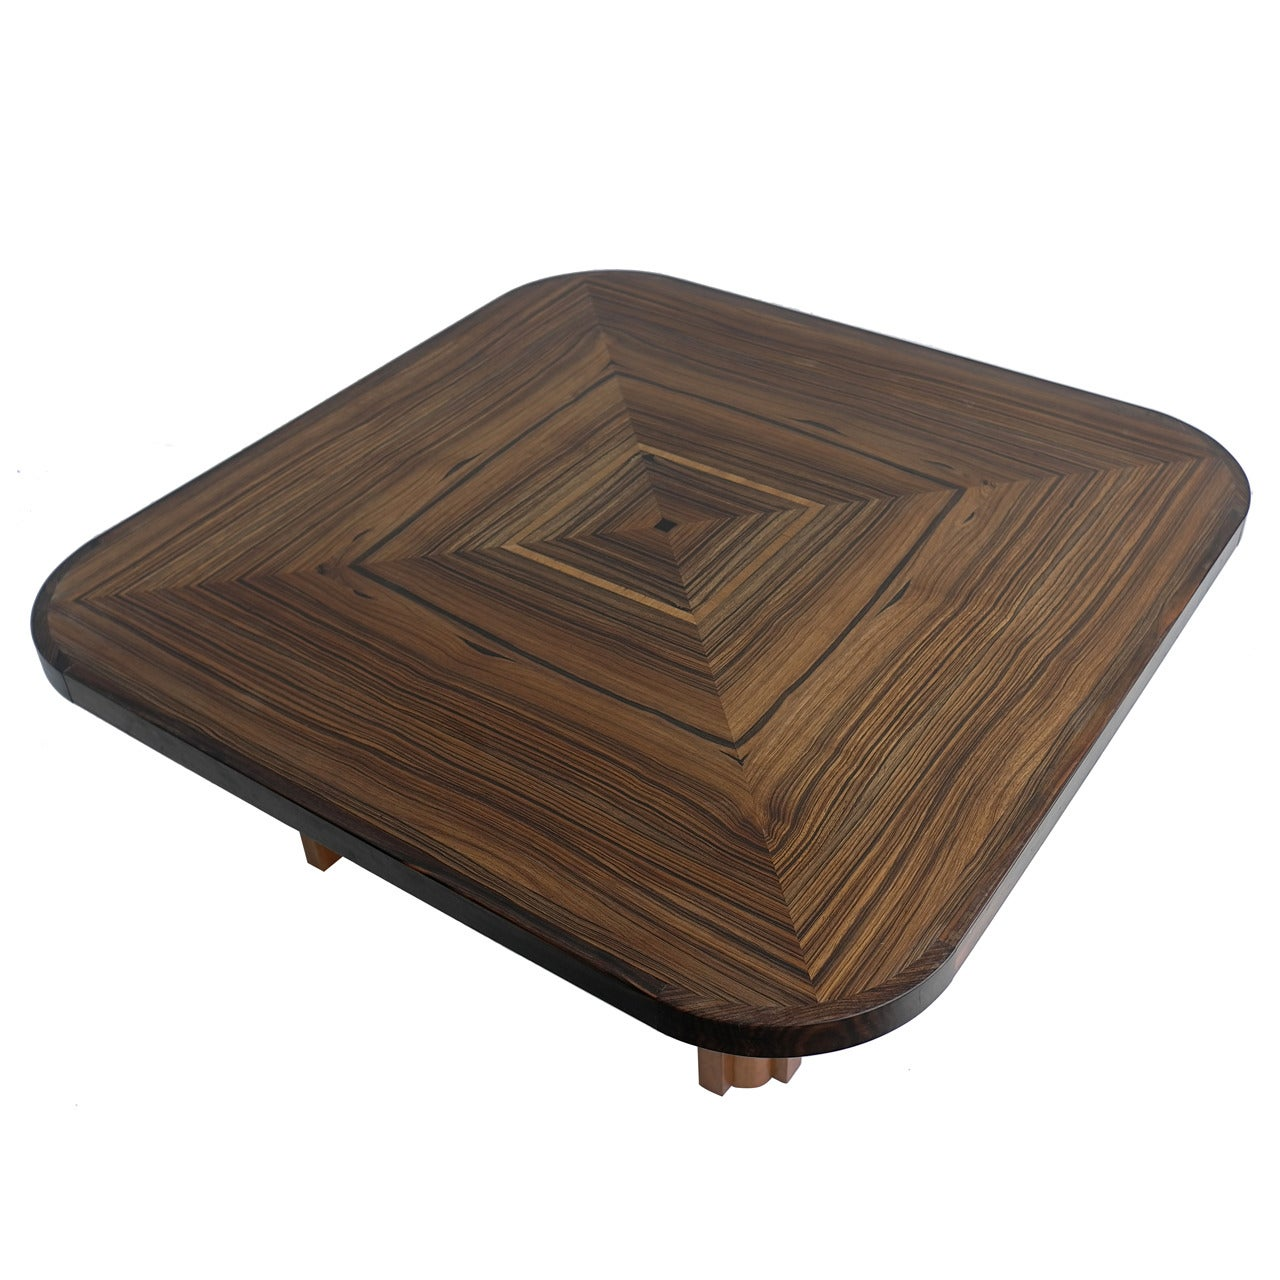 Sculptural Art Deco Coffee Table in Macassar Ebony